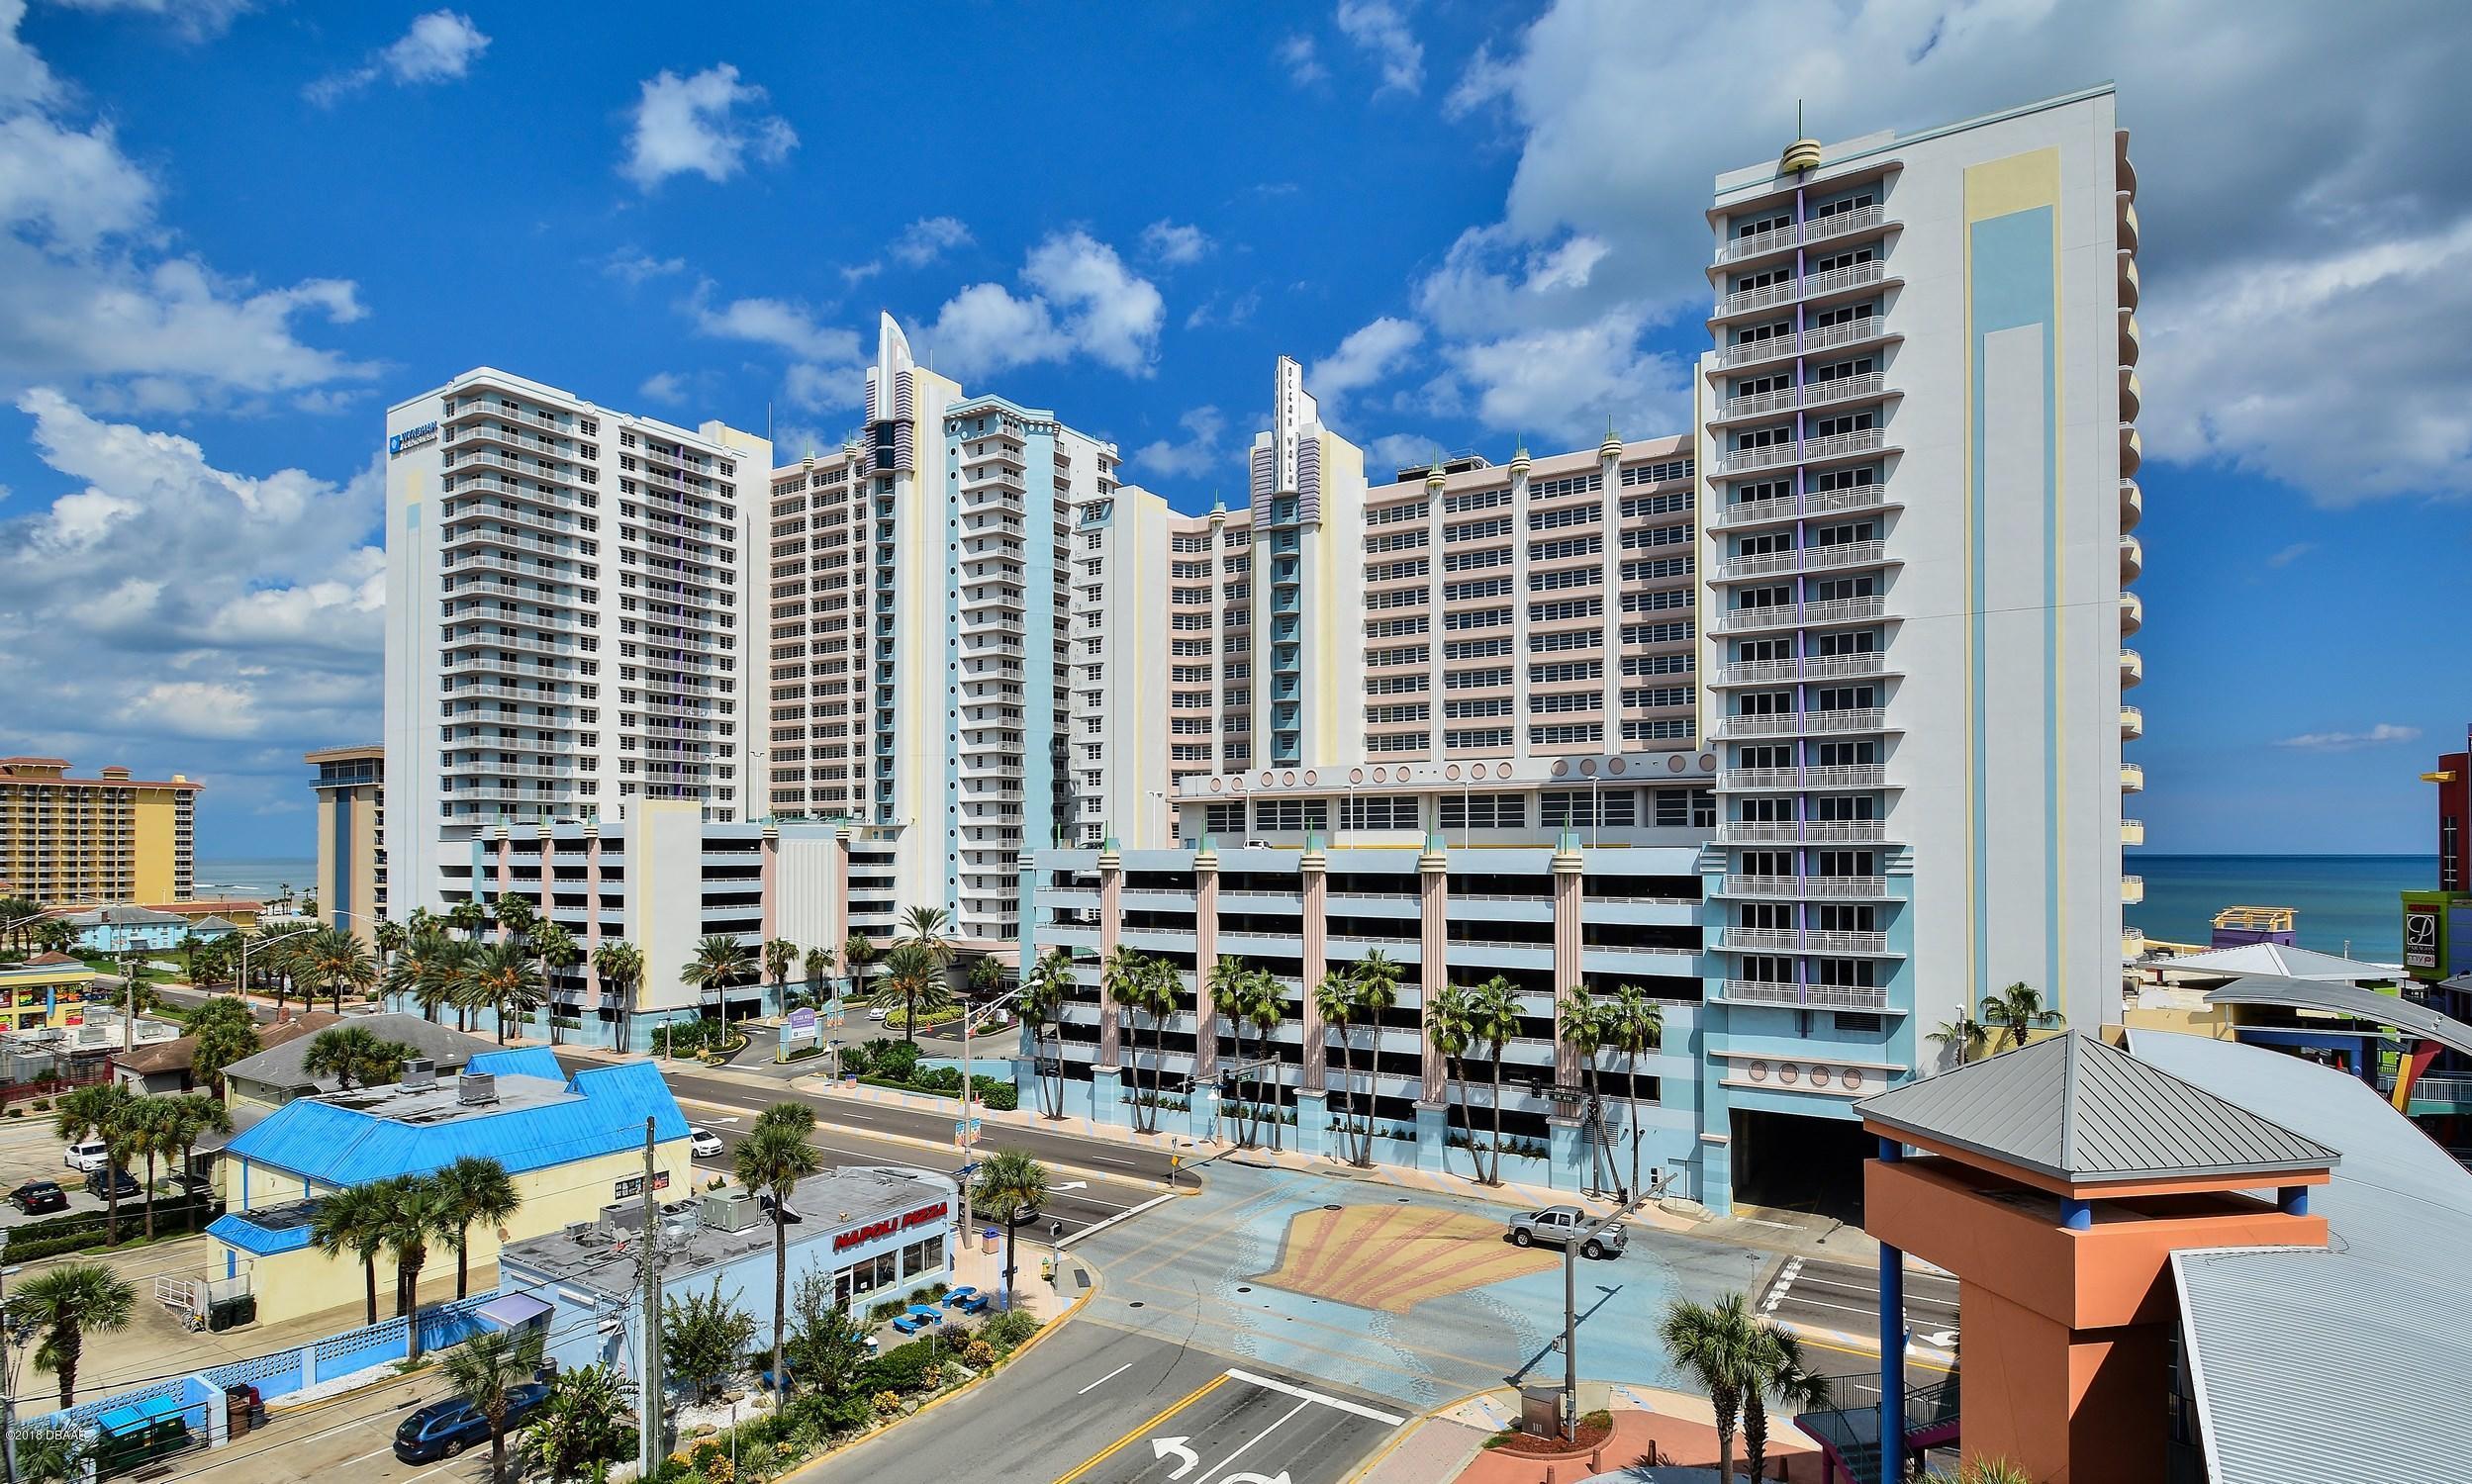 350 N Atlantic Avenue, Daytona Beach, Florida